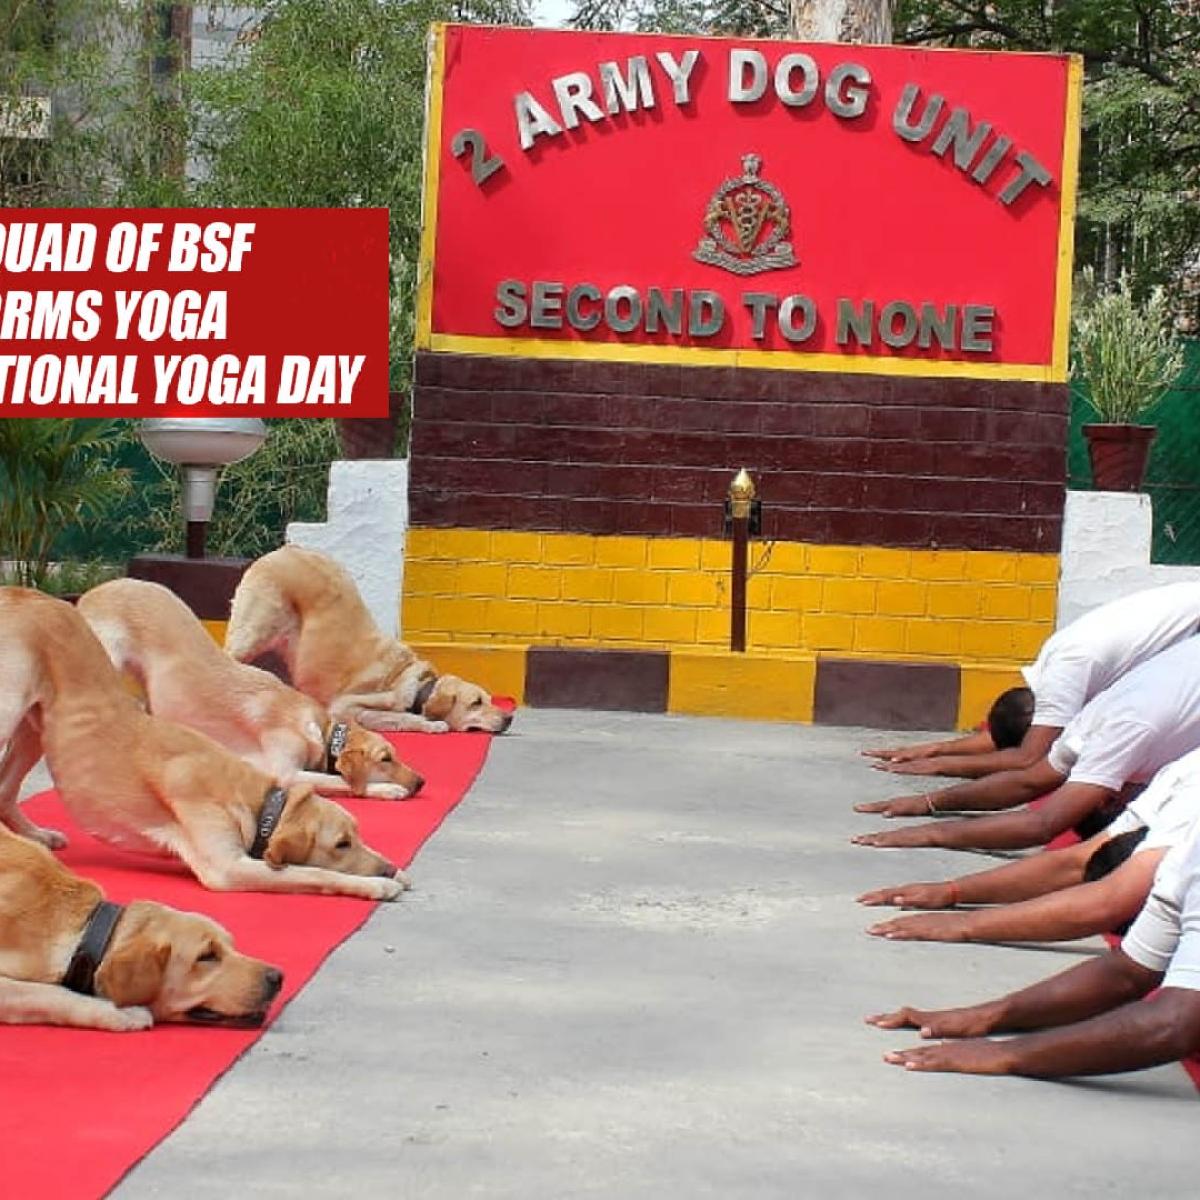 Watch: Dog Squad Of BSF Performs Yoga On 5th International Yoga Day